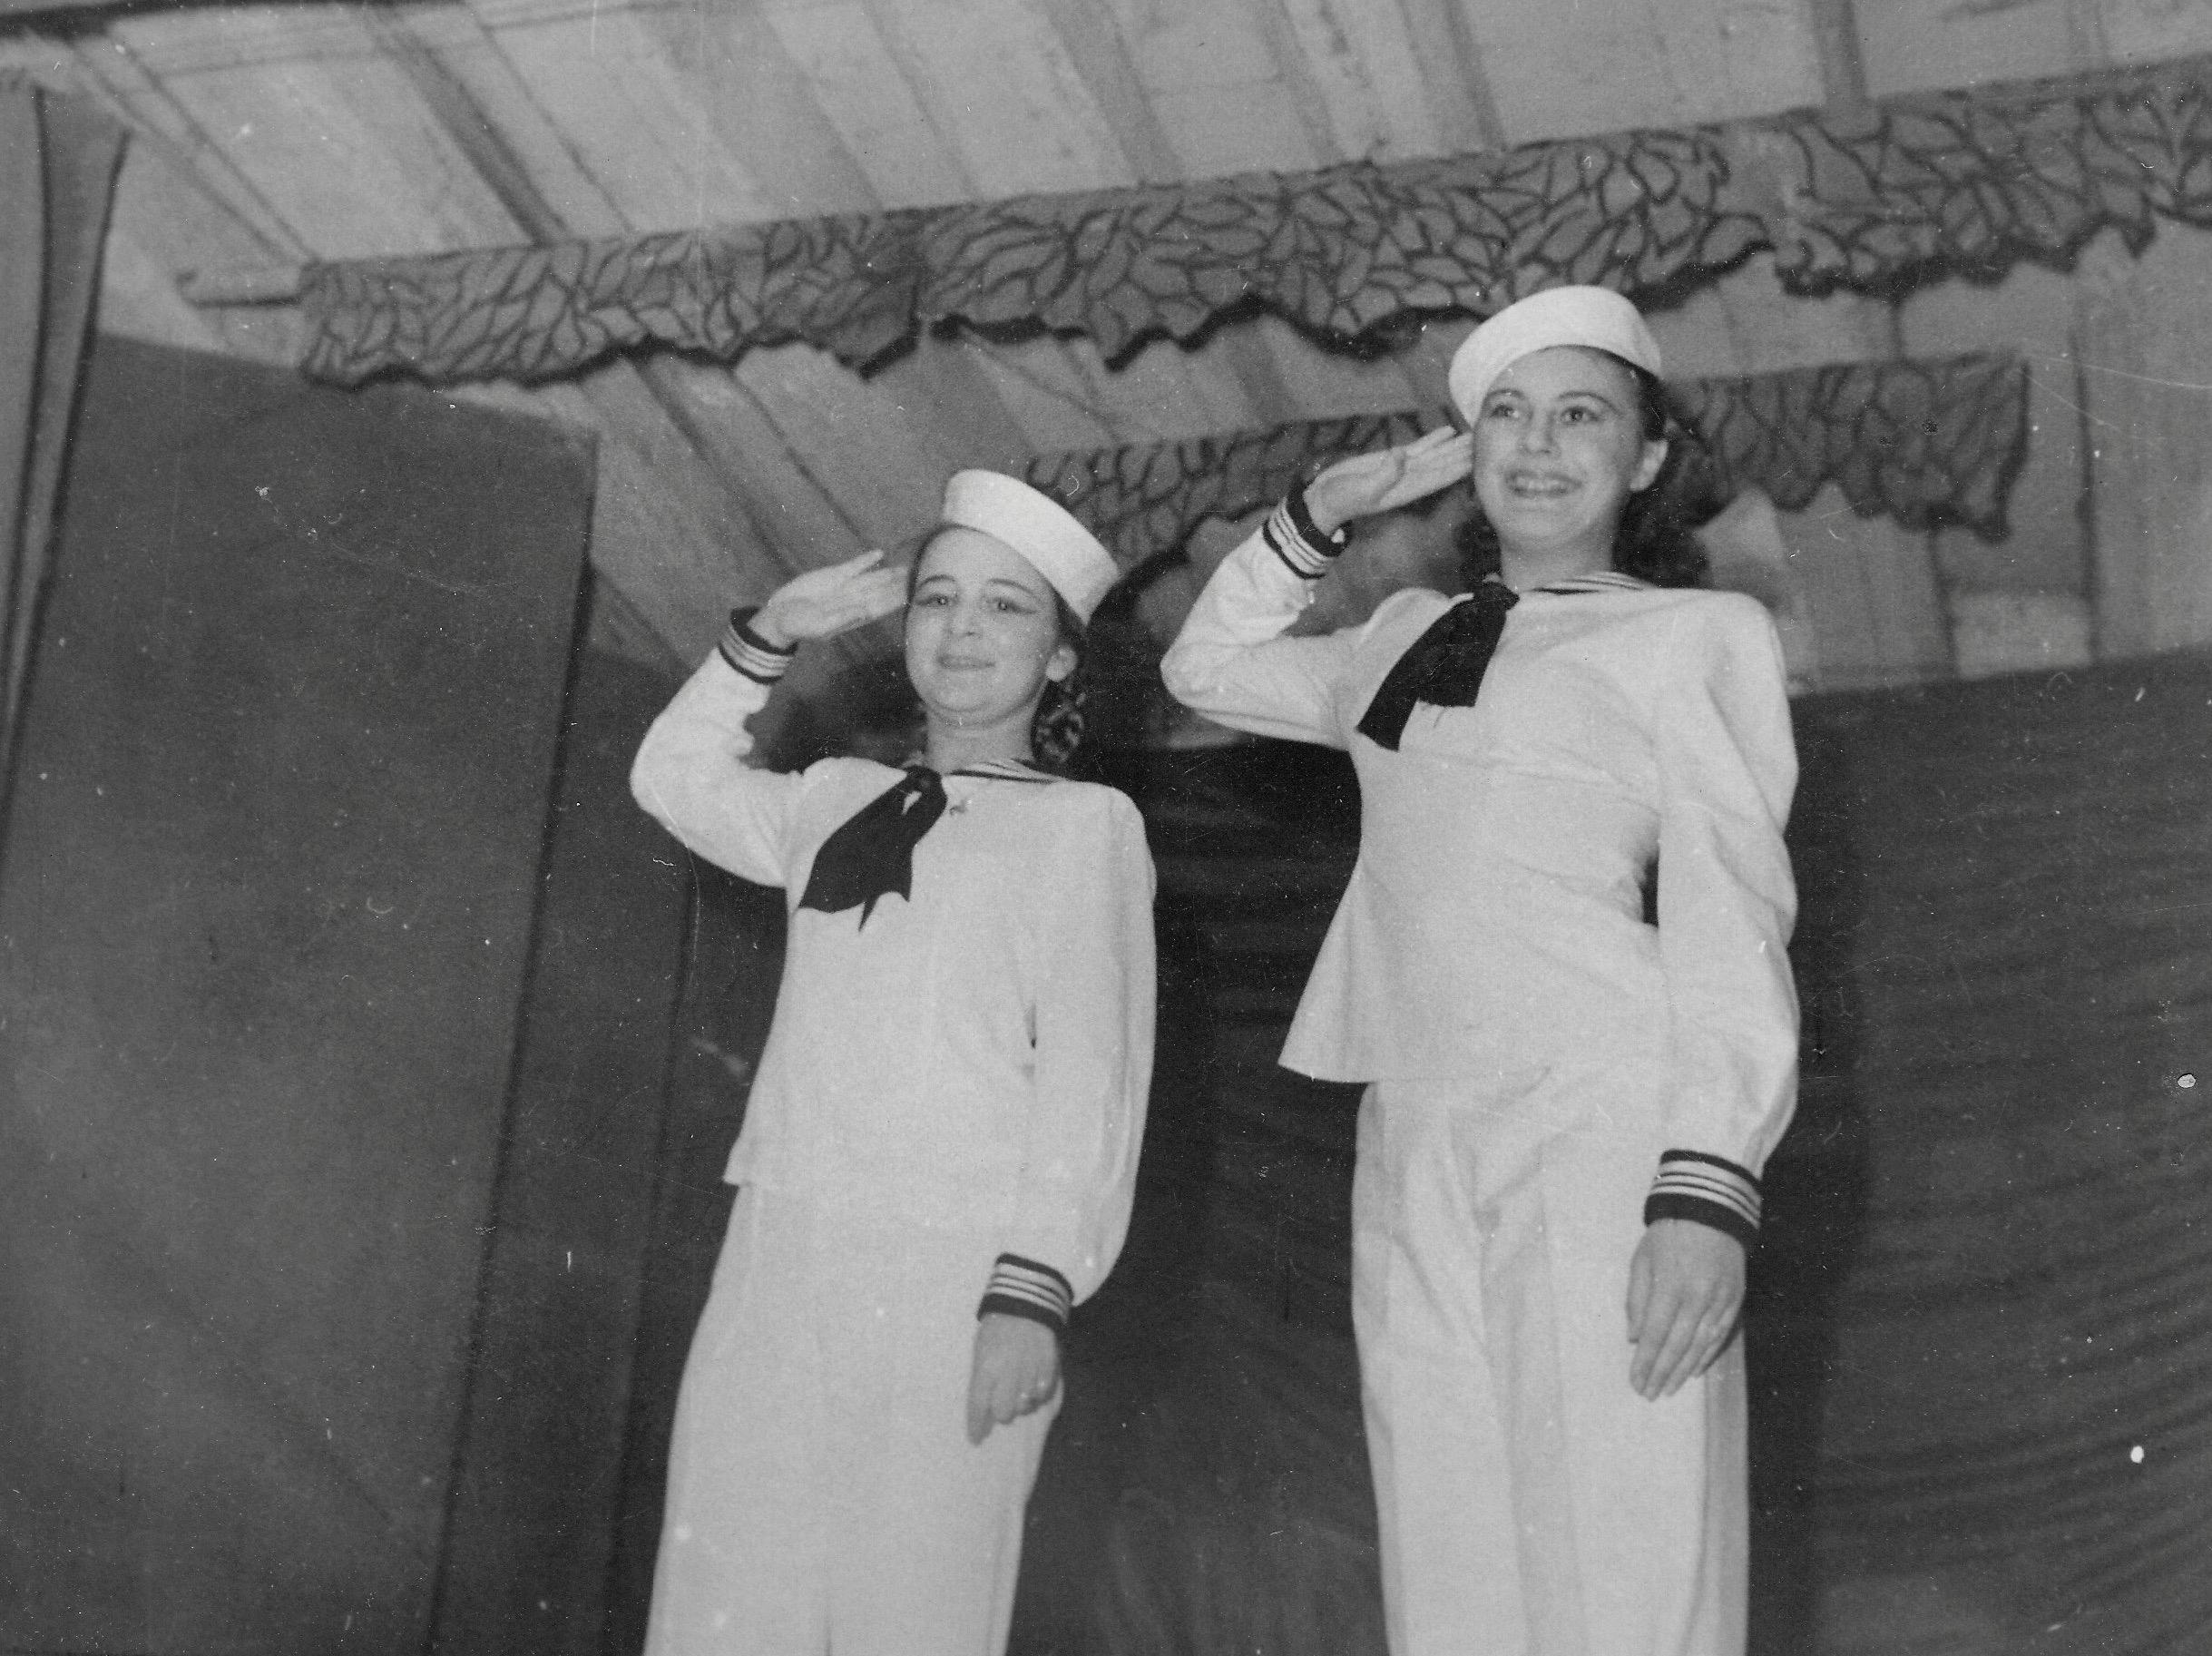 Trieste concert, Sailor Dance 1950